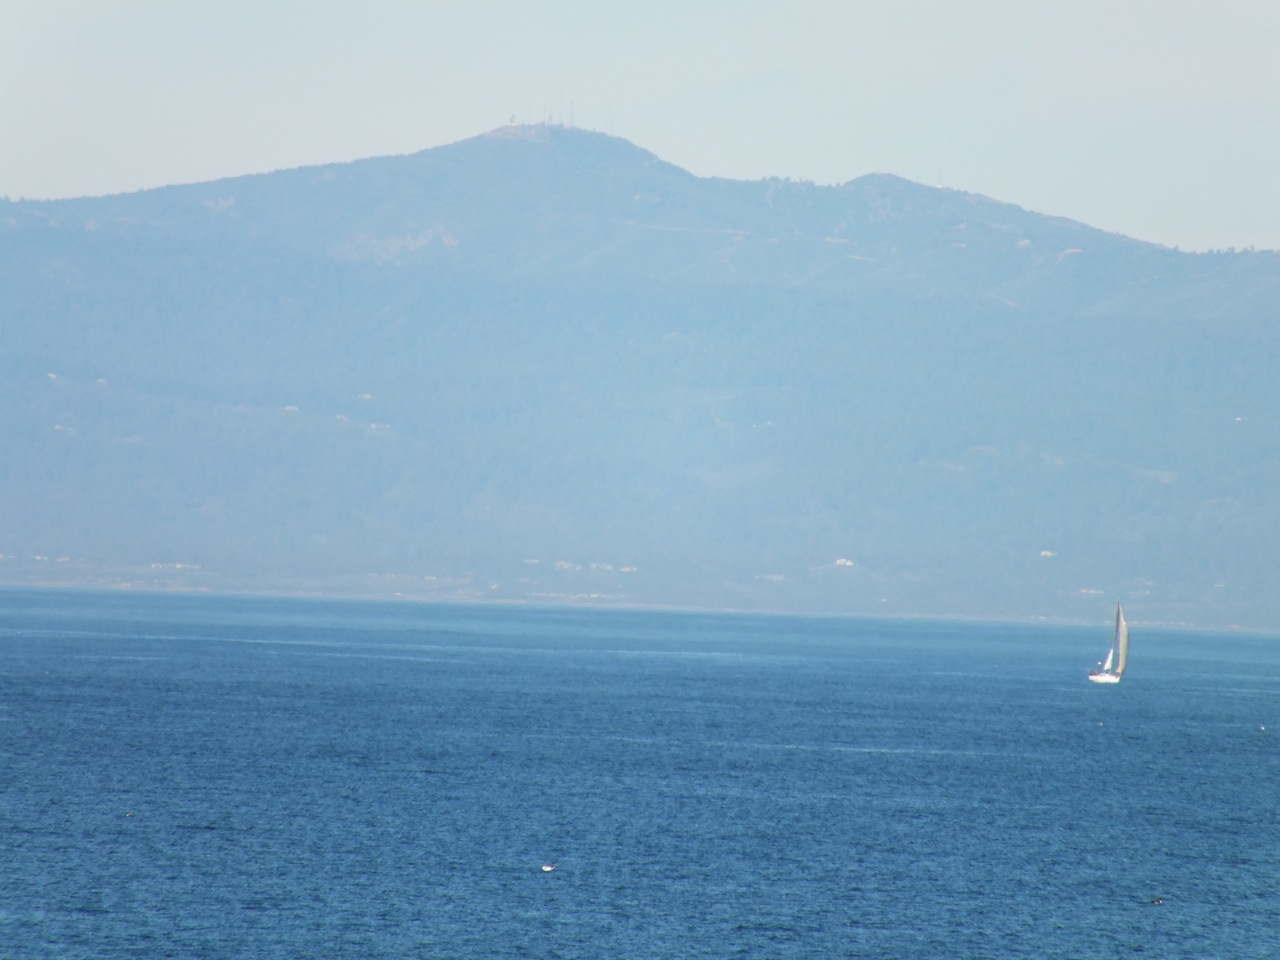 Telephoto image of Loma Prieta from Monterey